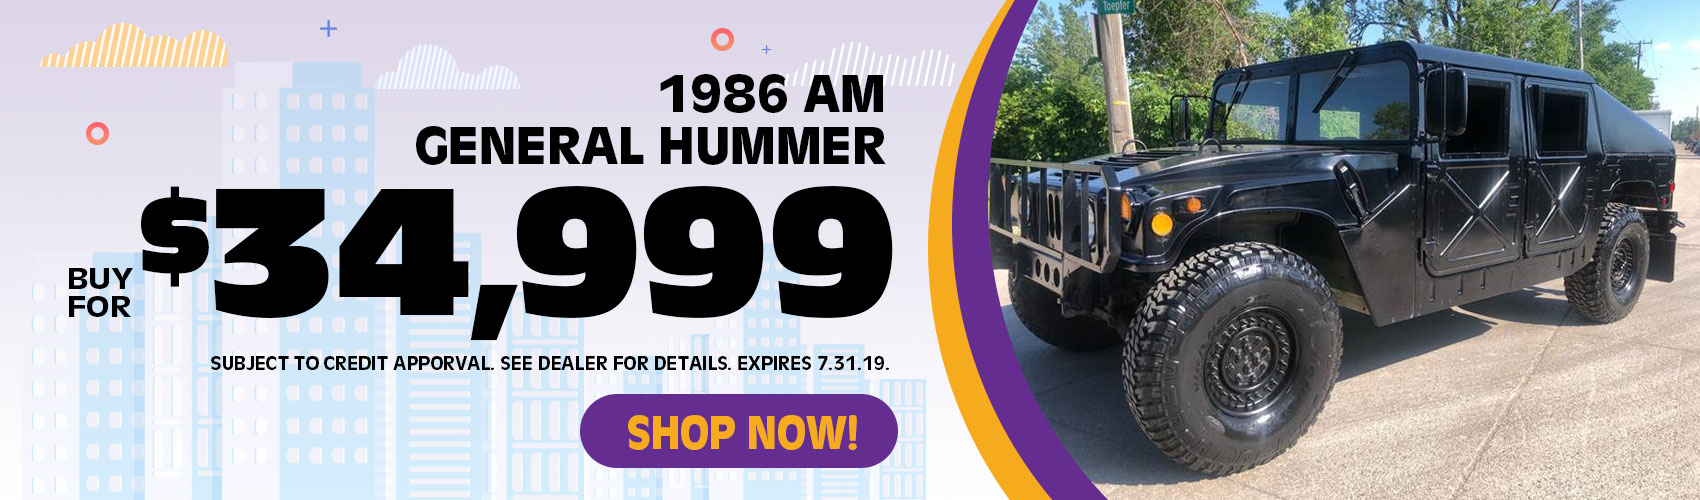 1986 AM General Hummer